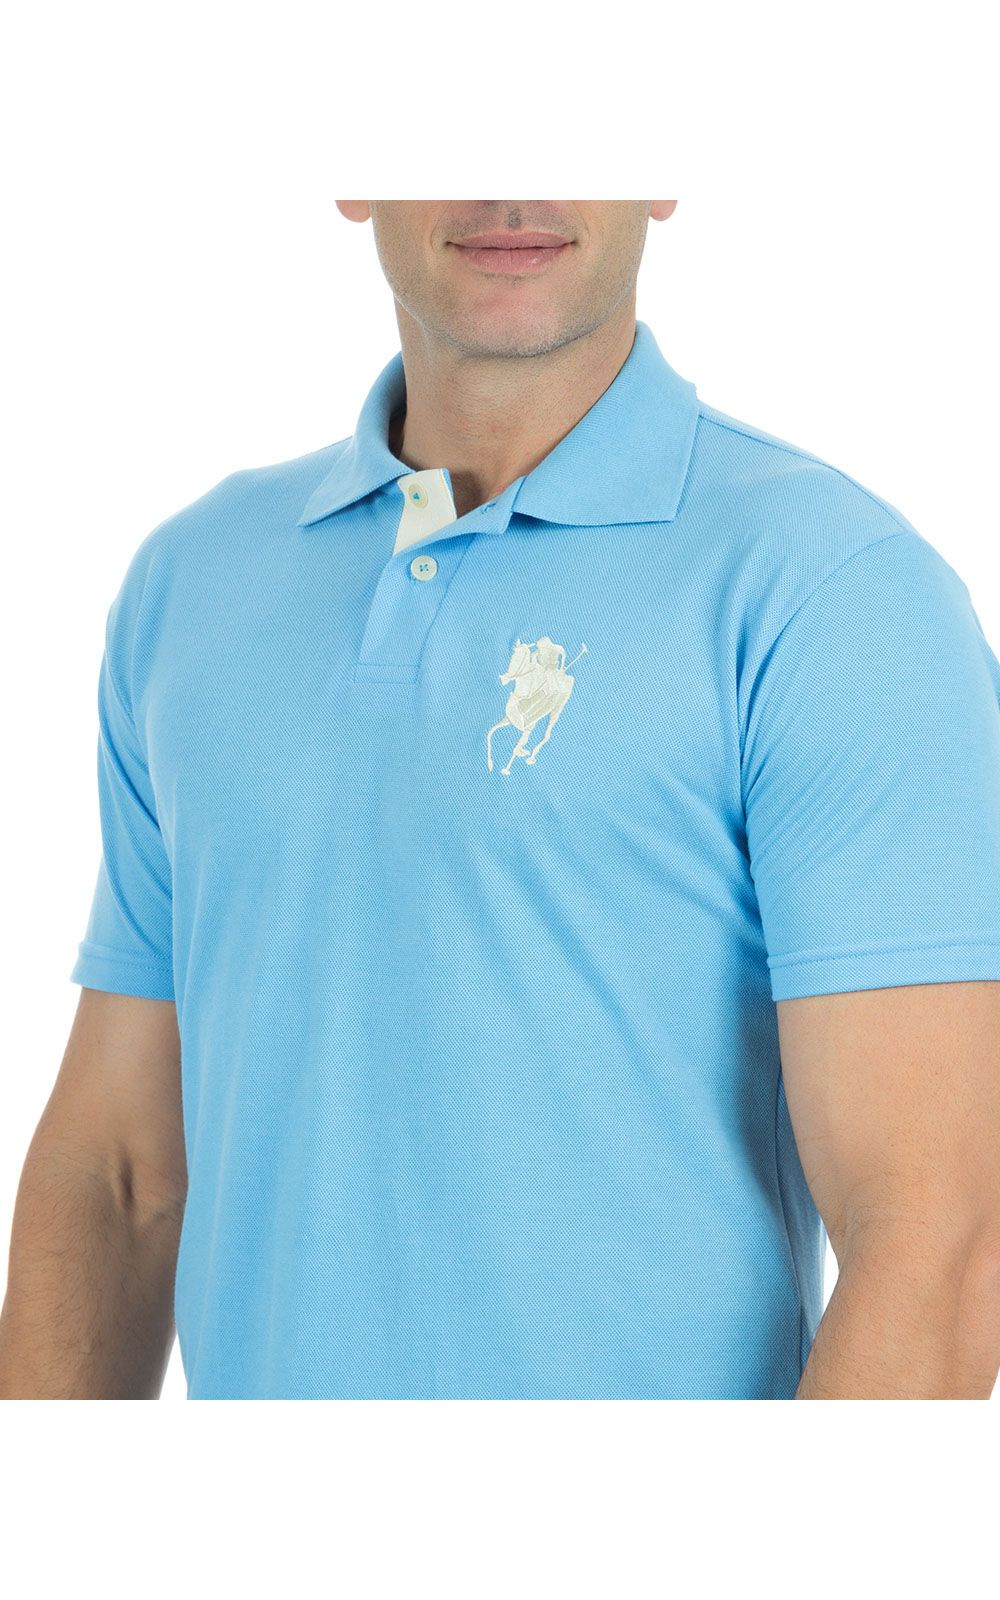 Foto 3 - Camisa Polo Masculina Azul Claro Bordada